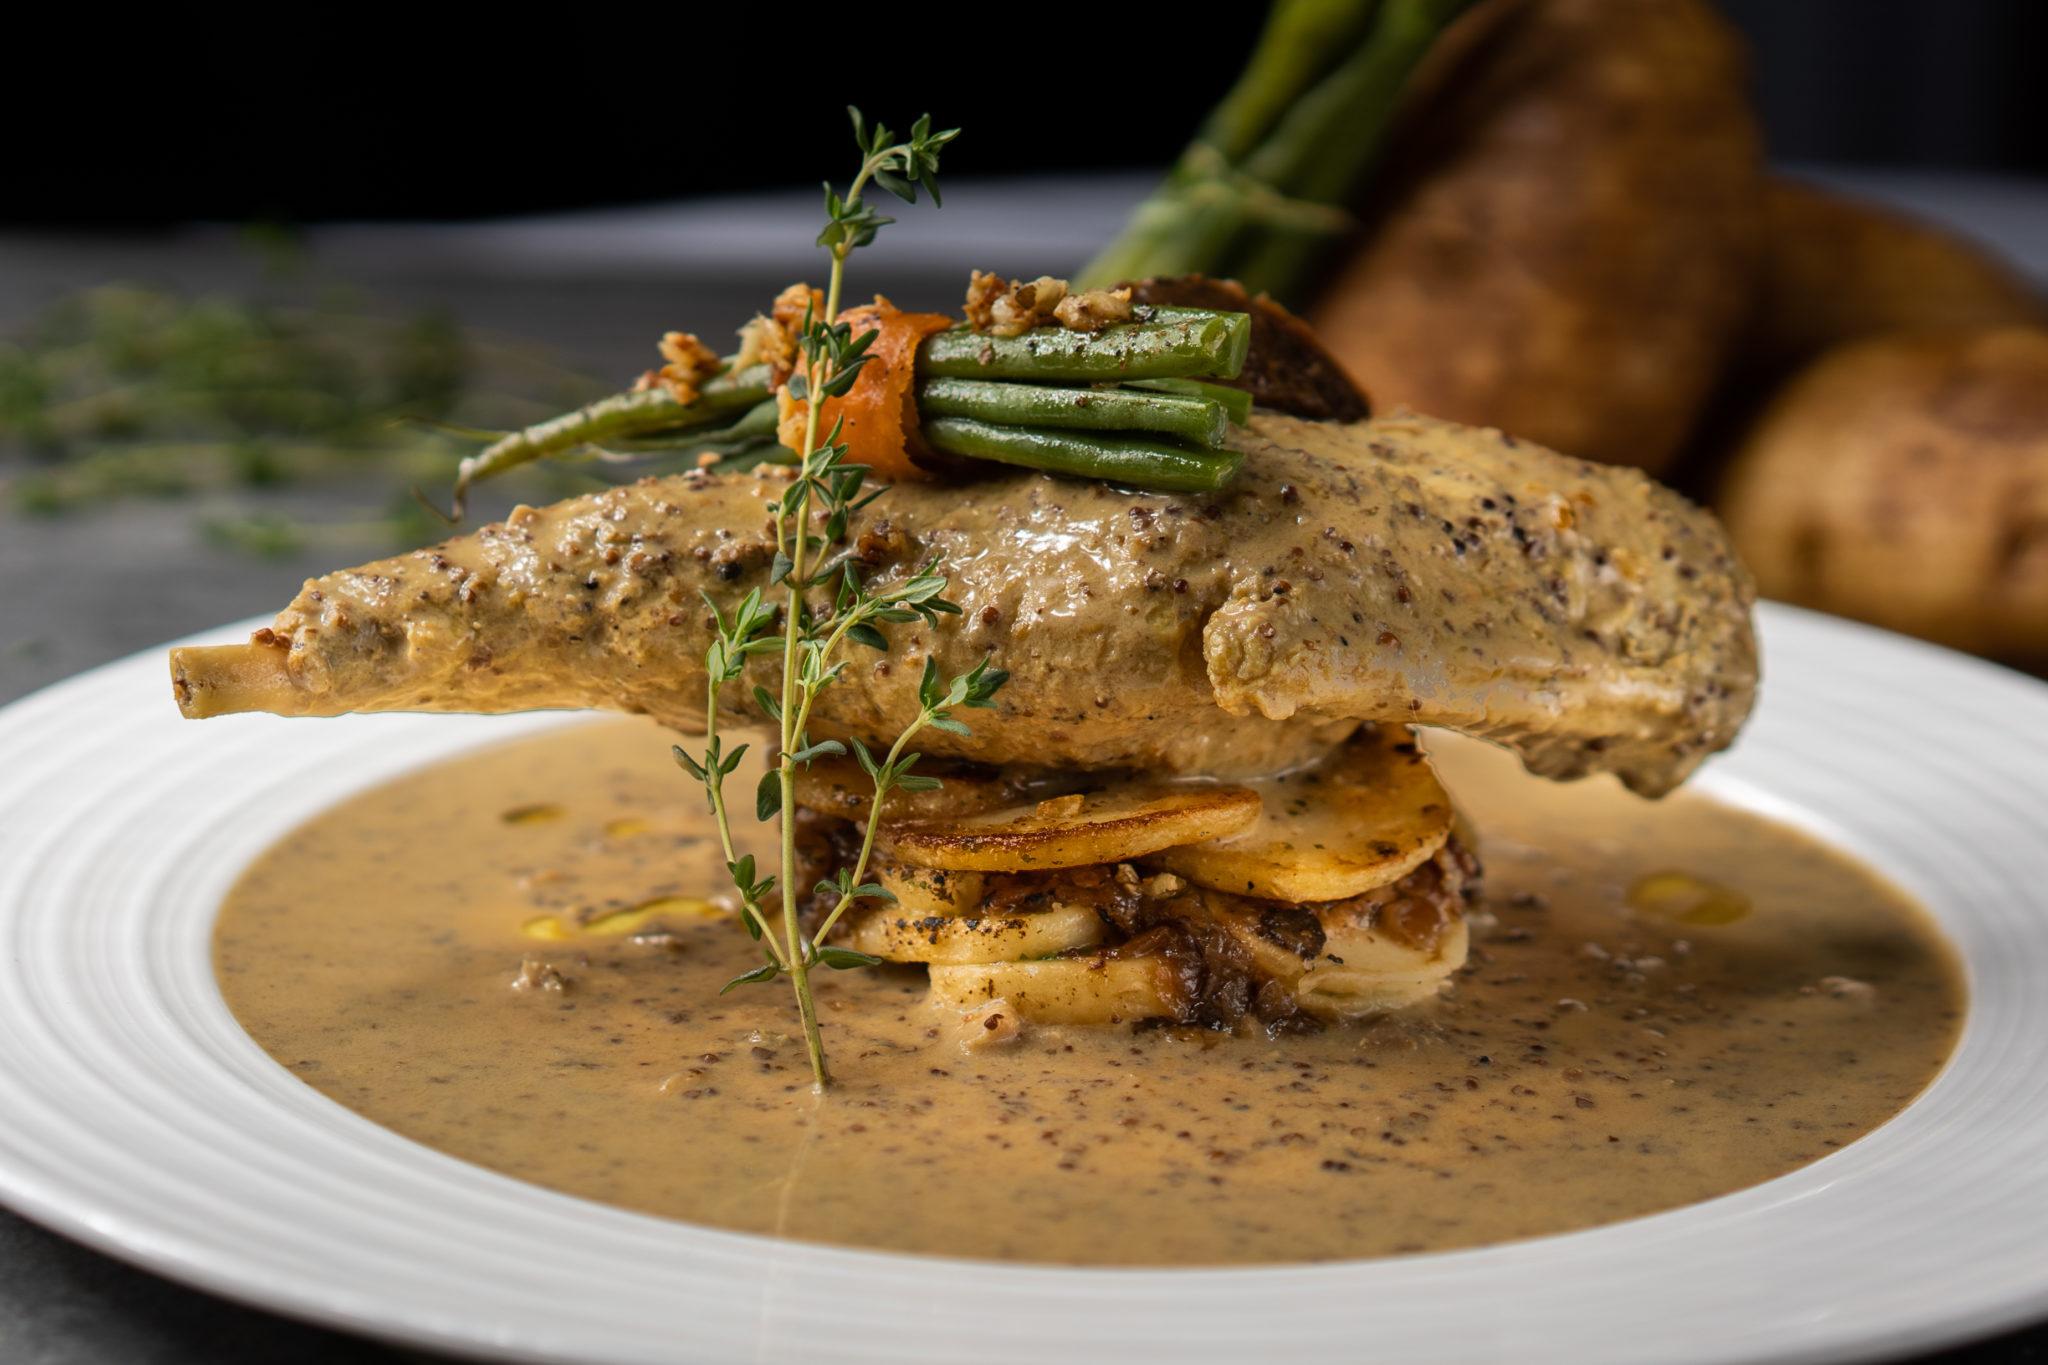 Taratata Brasserie - Rabbit Leg in Mustard Sauce